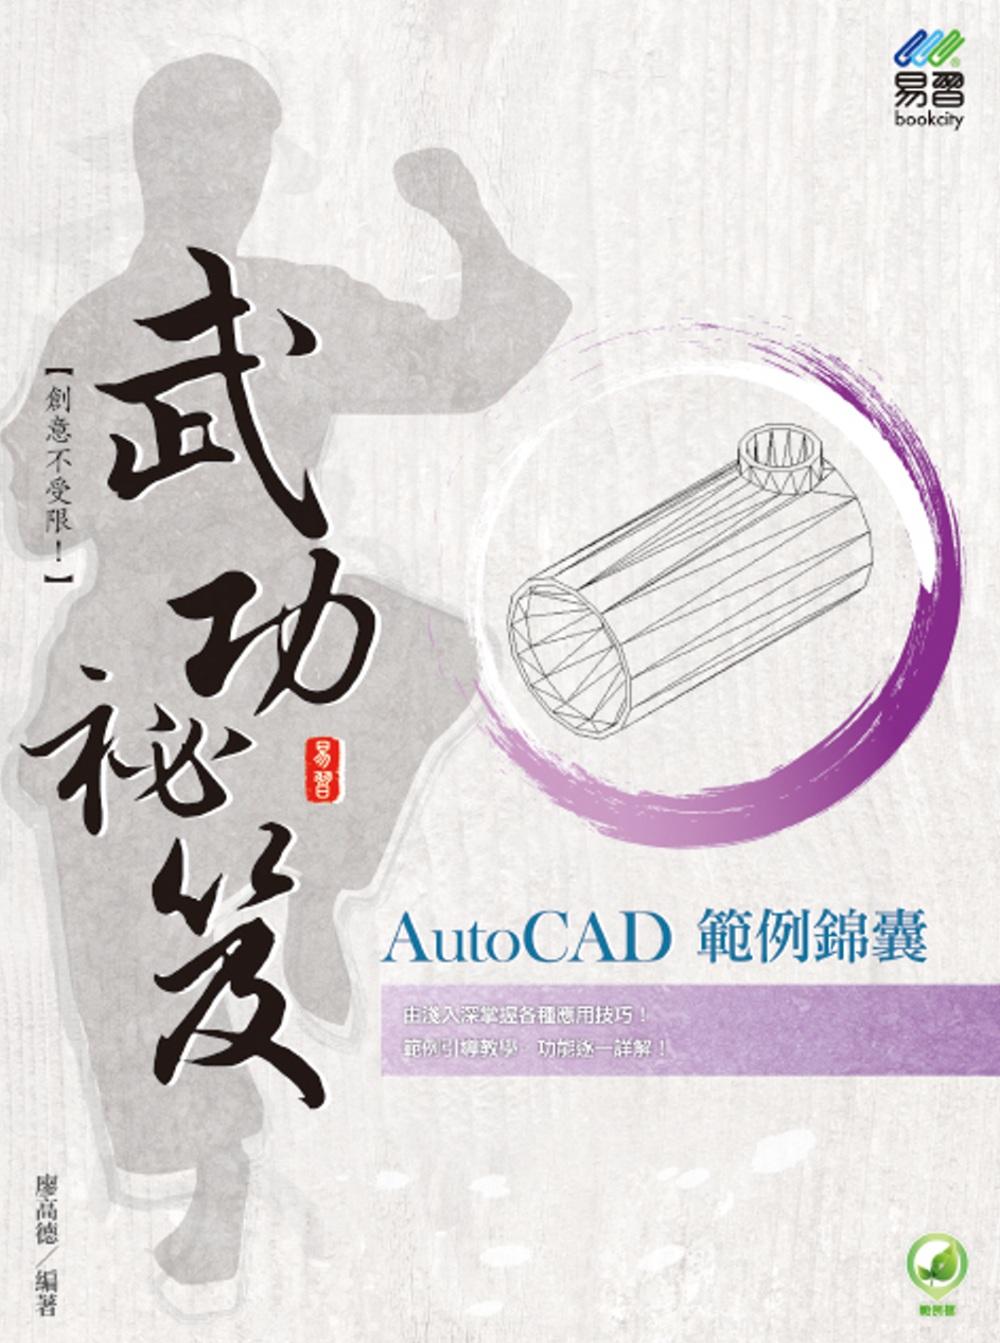 AutoCAD範例錦囊 武功祕...